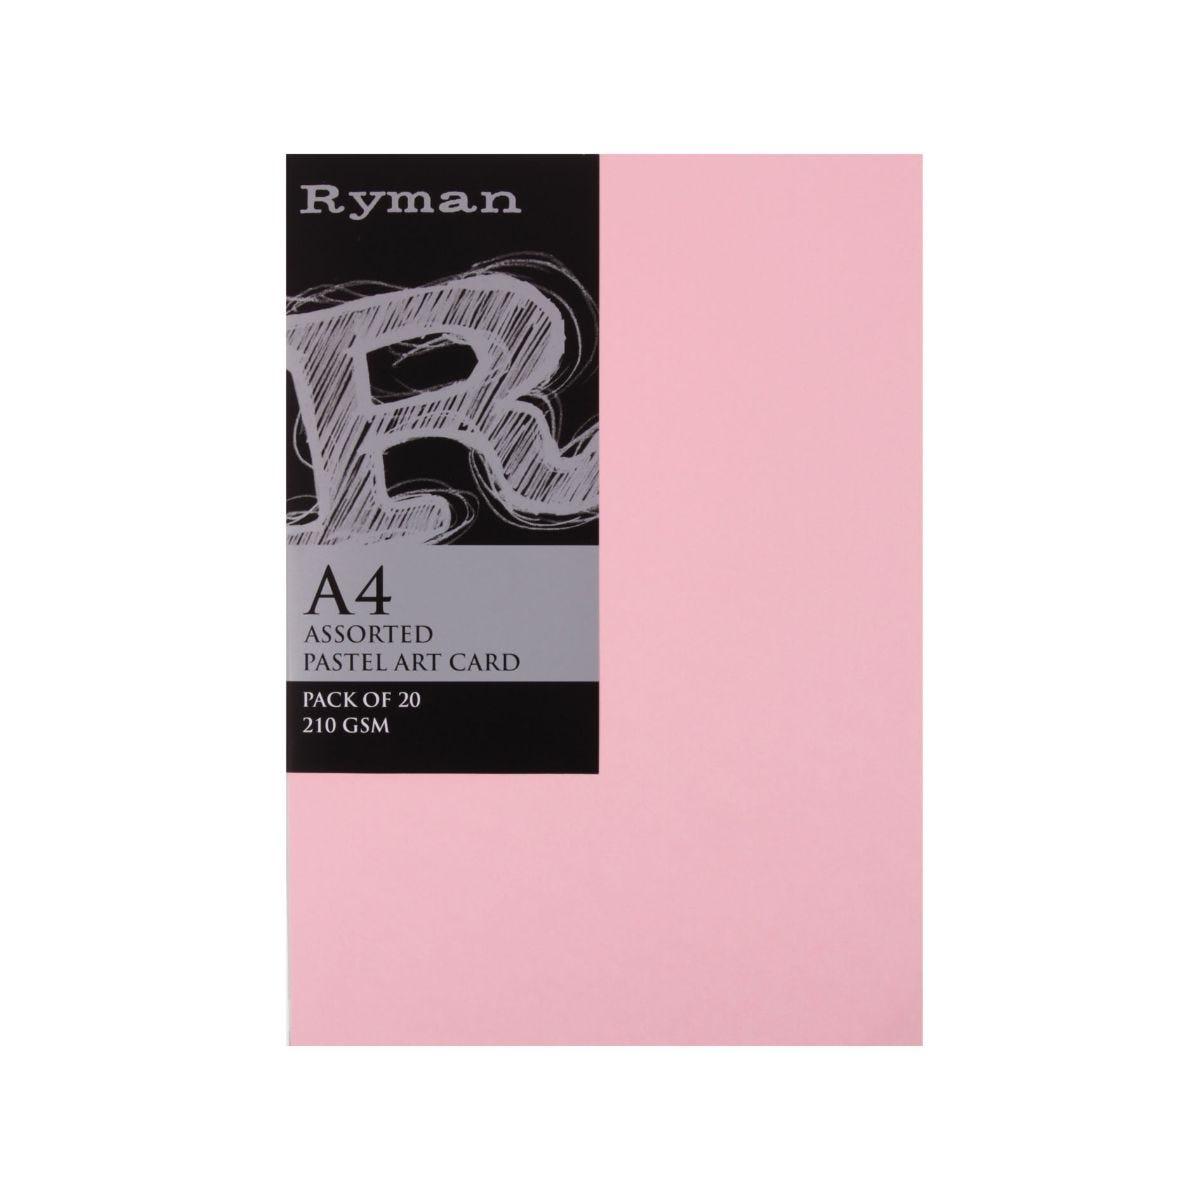 Ryman Artcard A4 210gsm Pack 20, Pastel